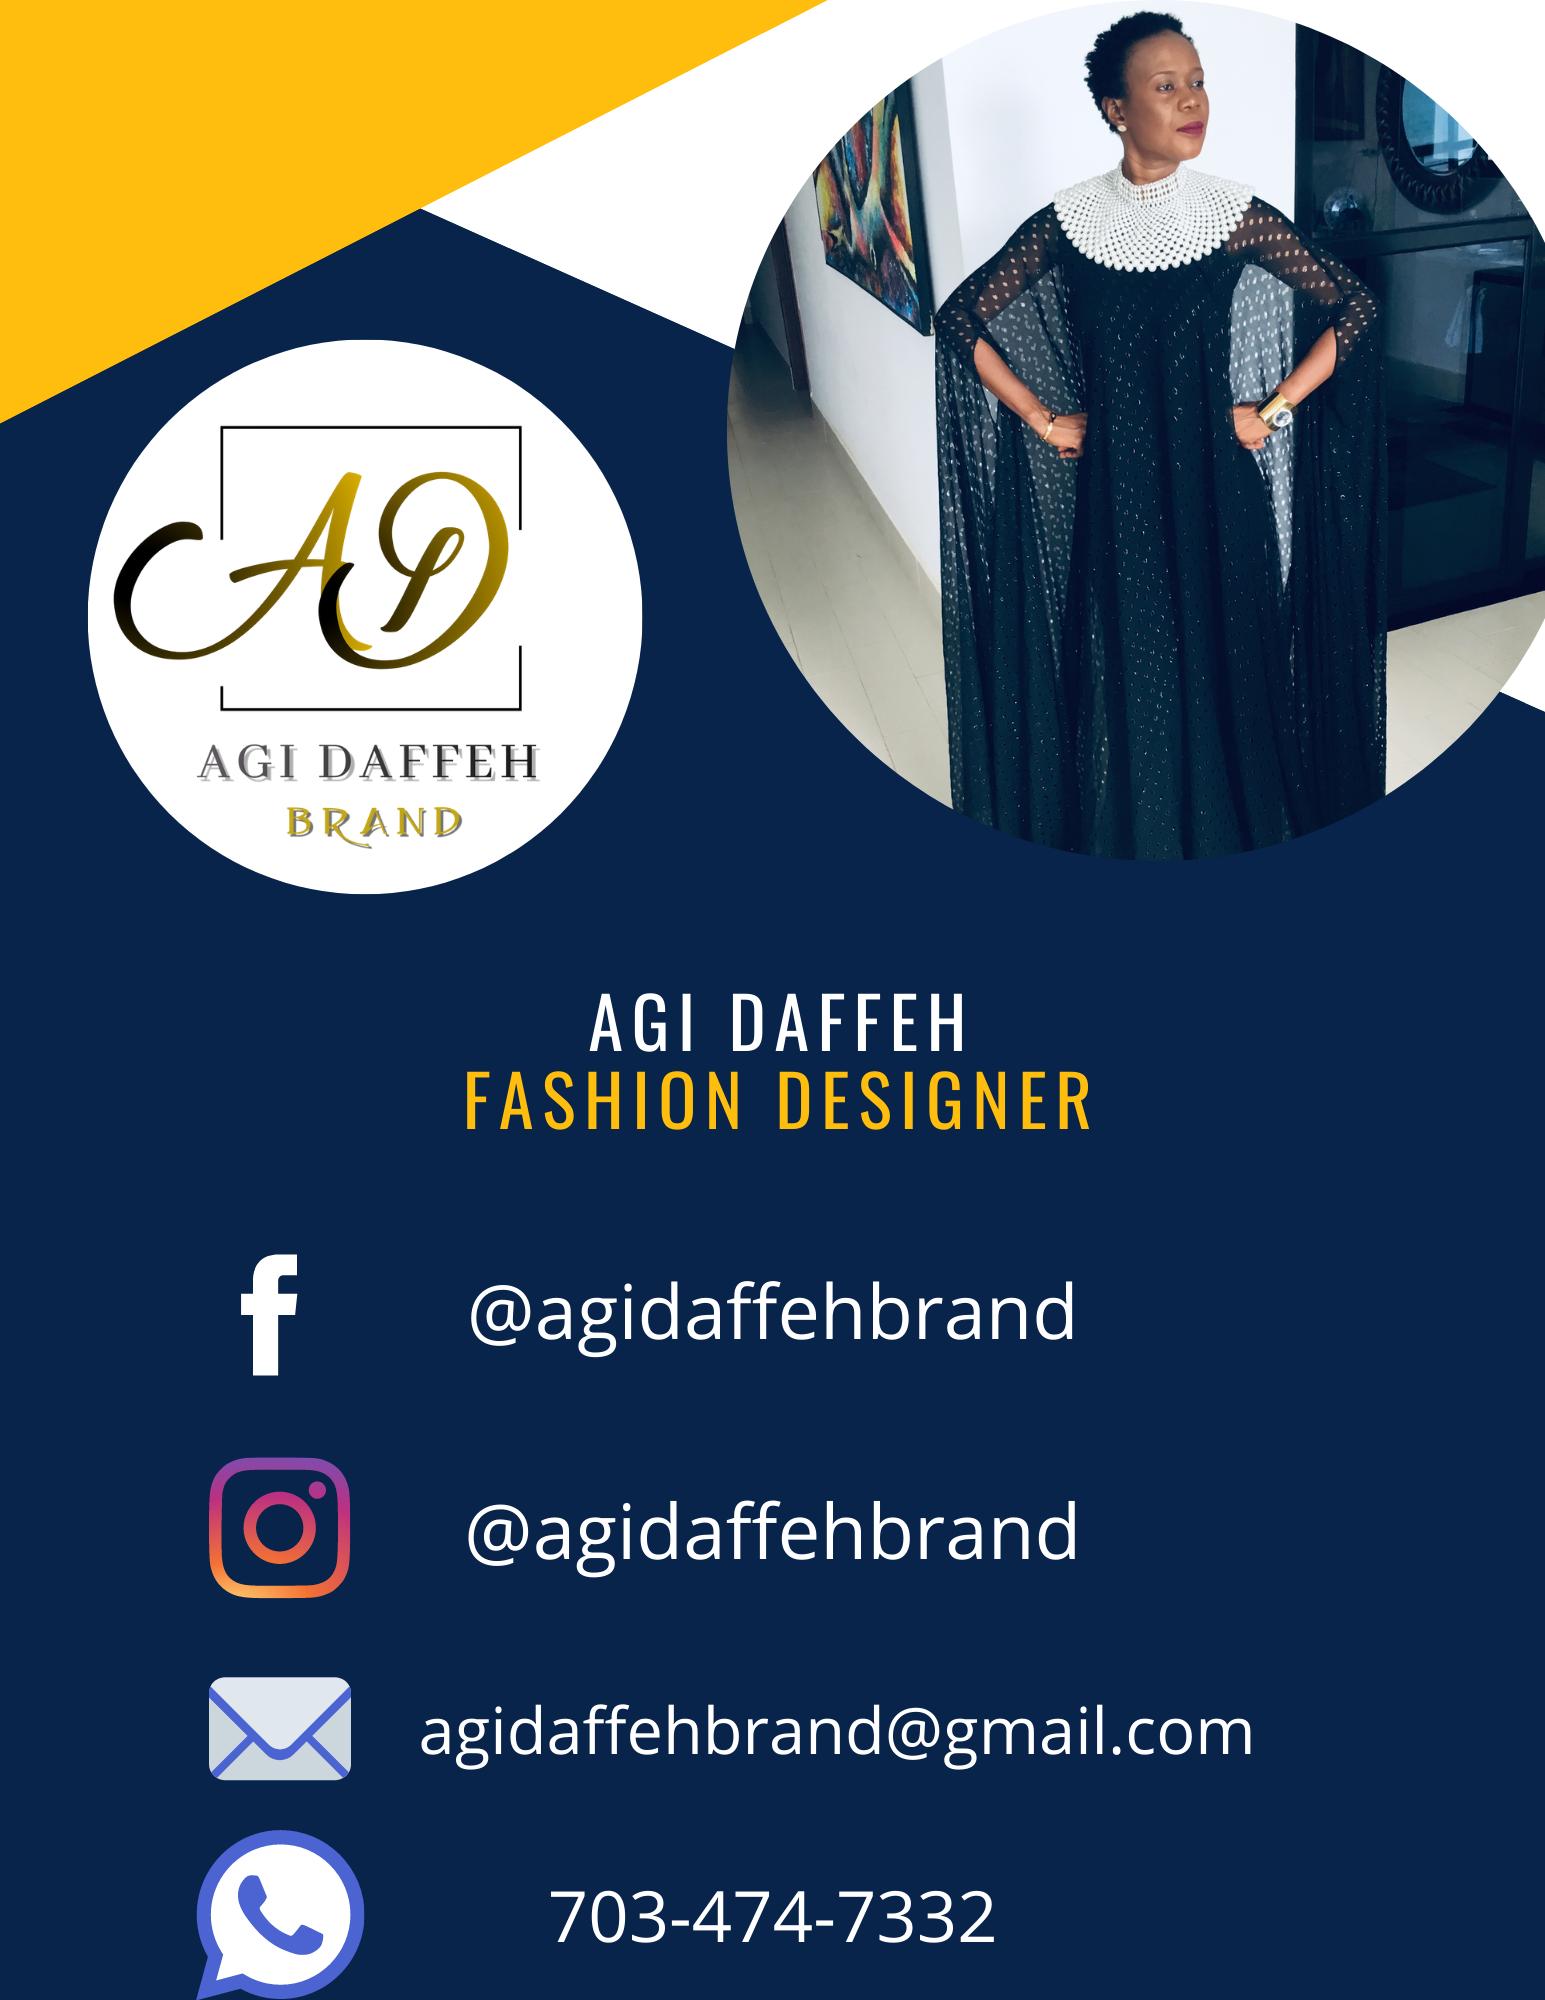 Agi Daffeh